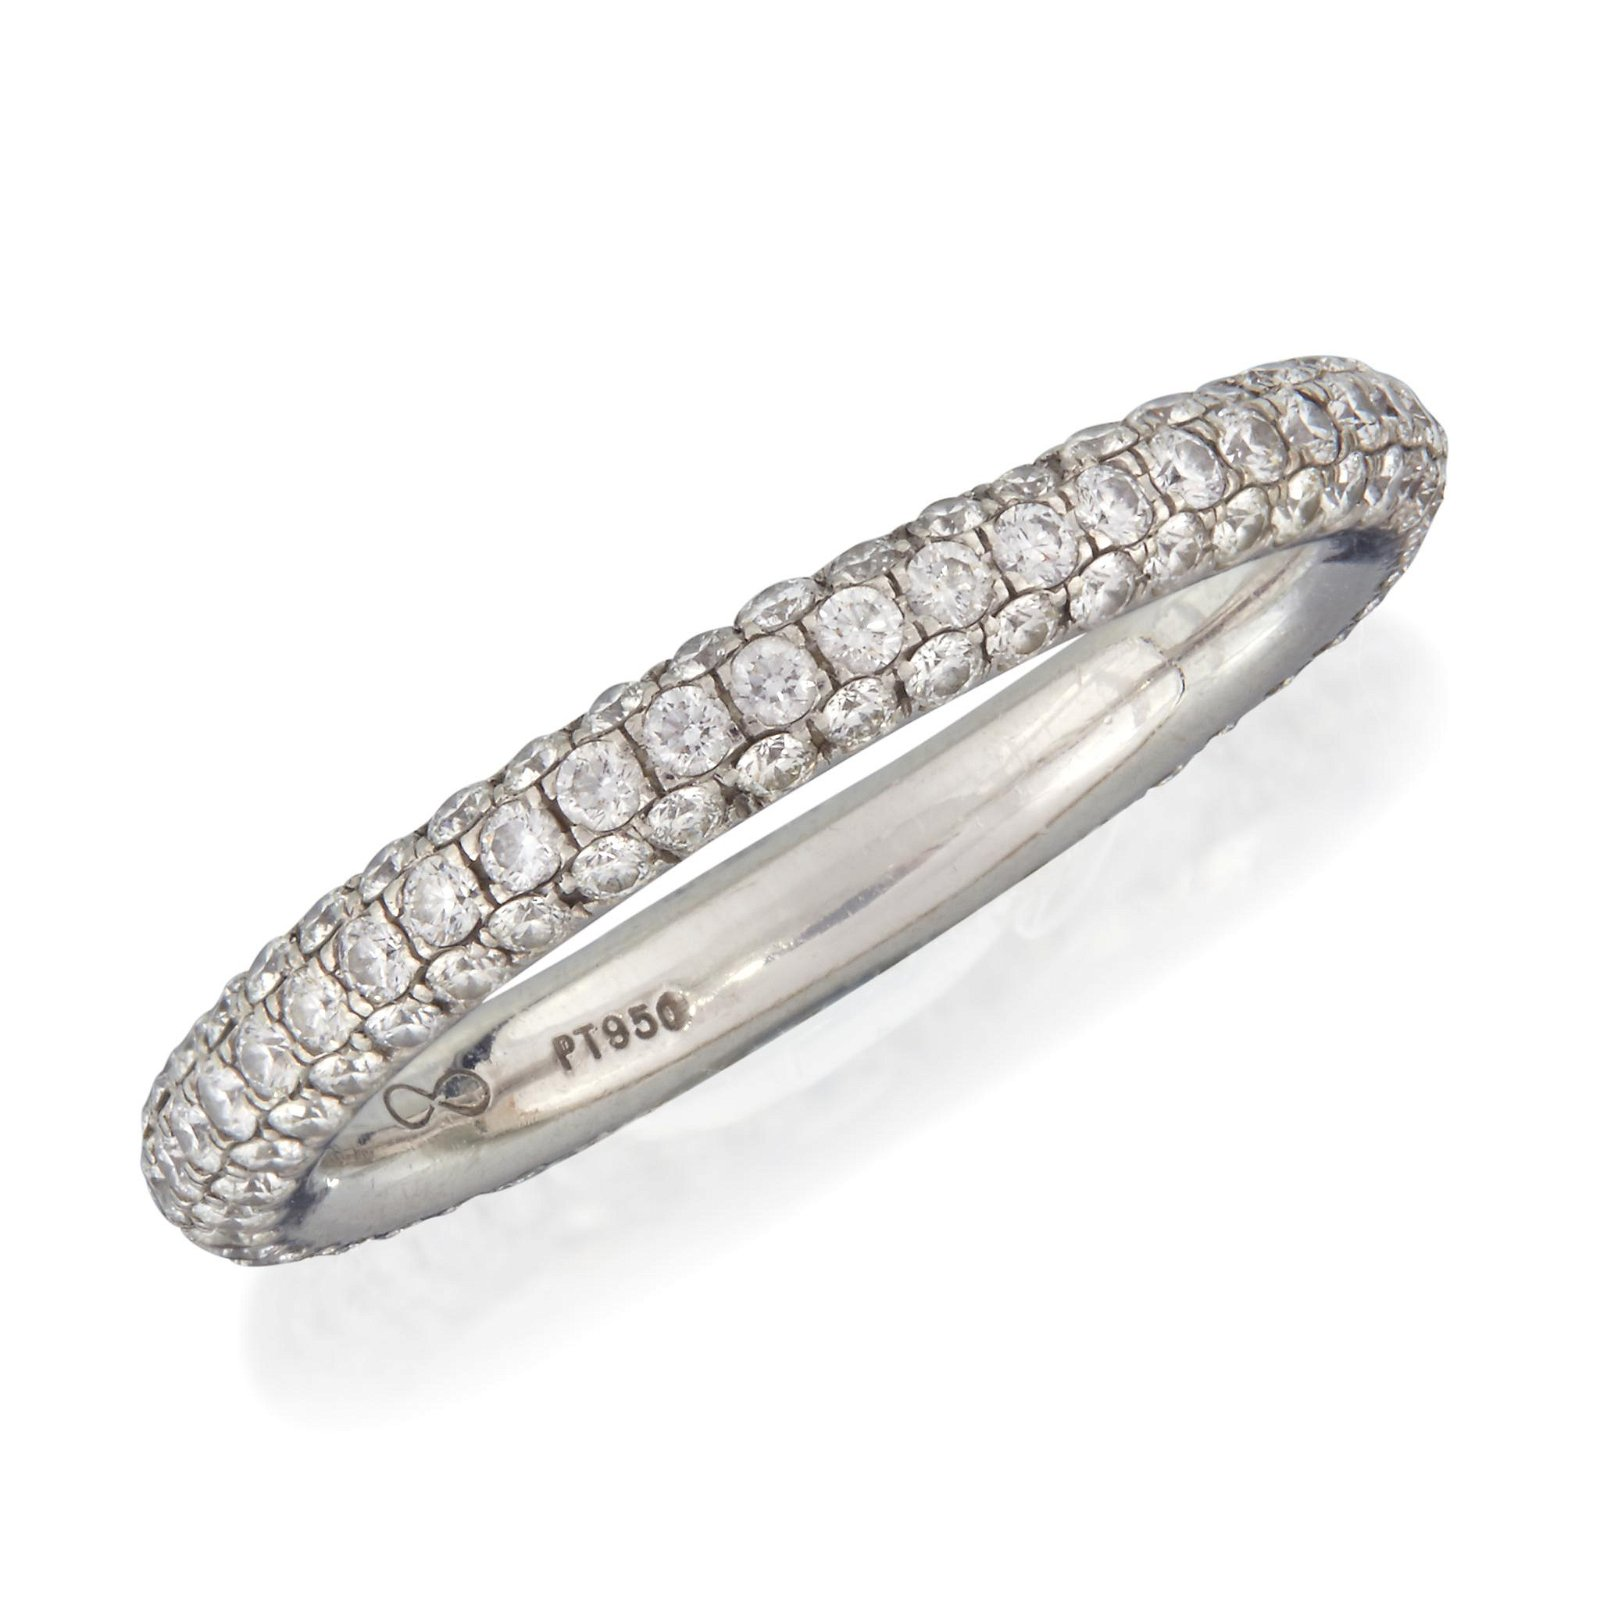 A platinum and diamond eternity band,